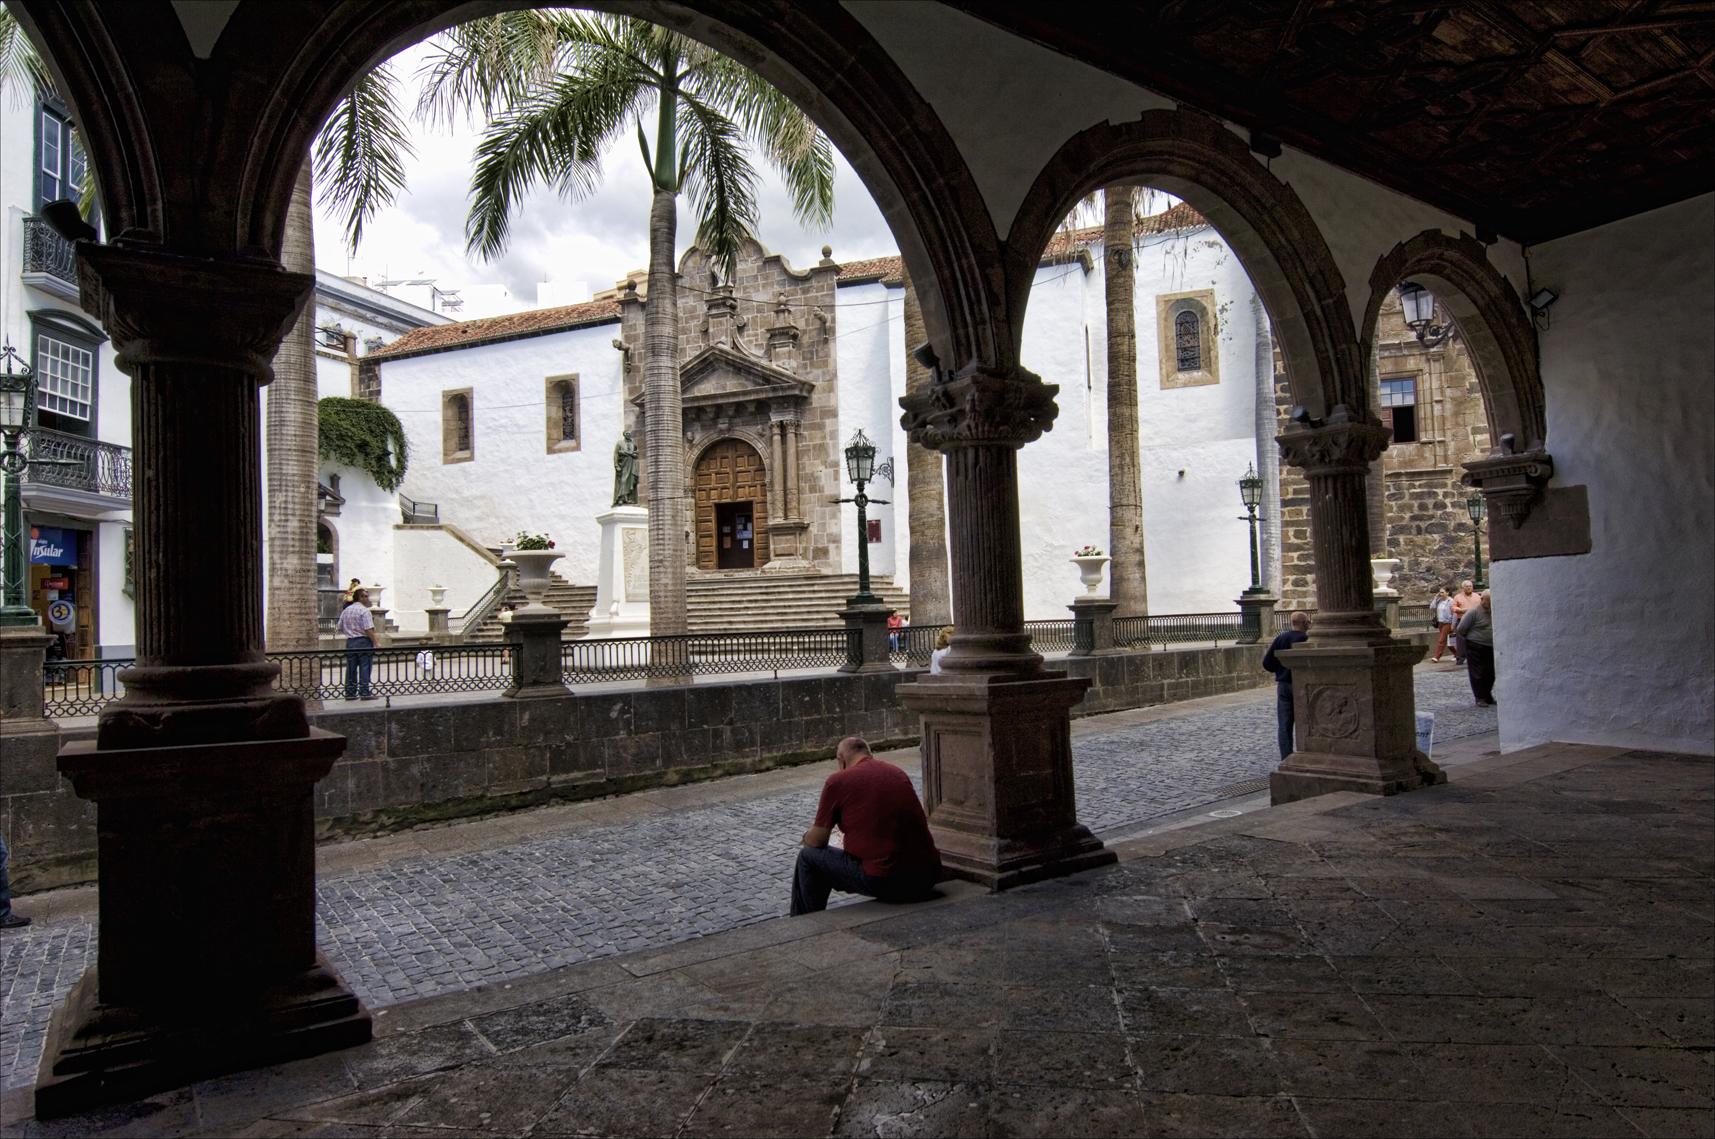 Plaza de España i Santa Cruz de La Palma